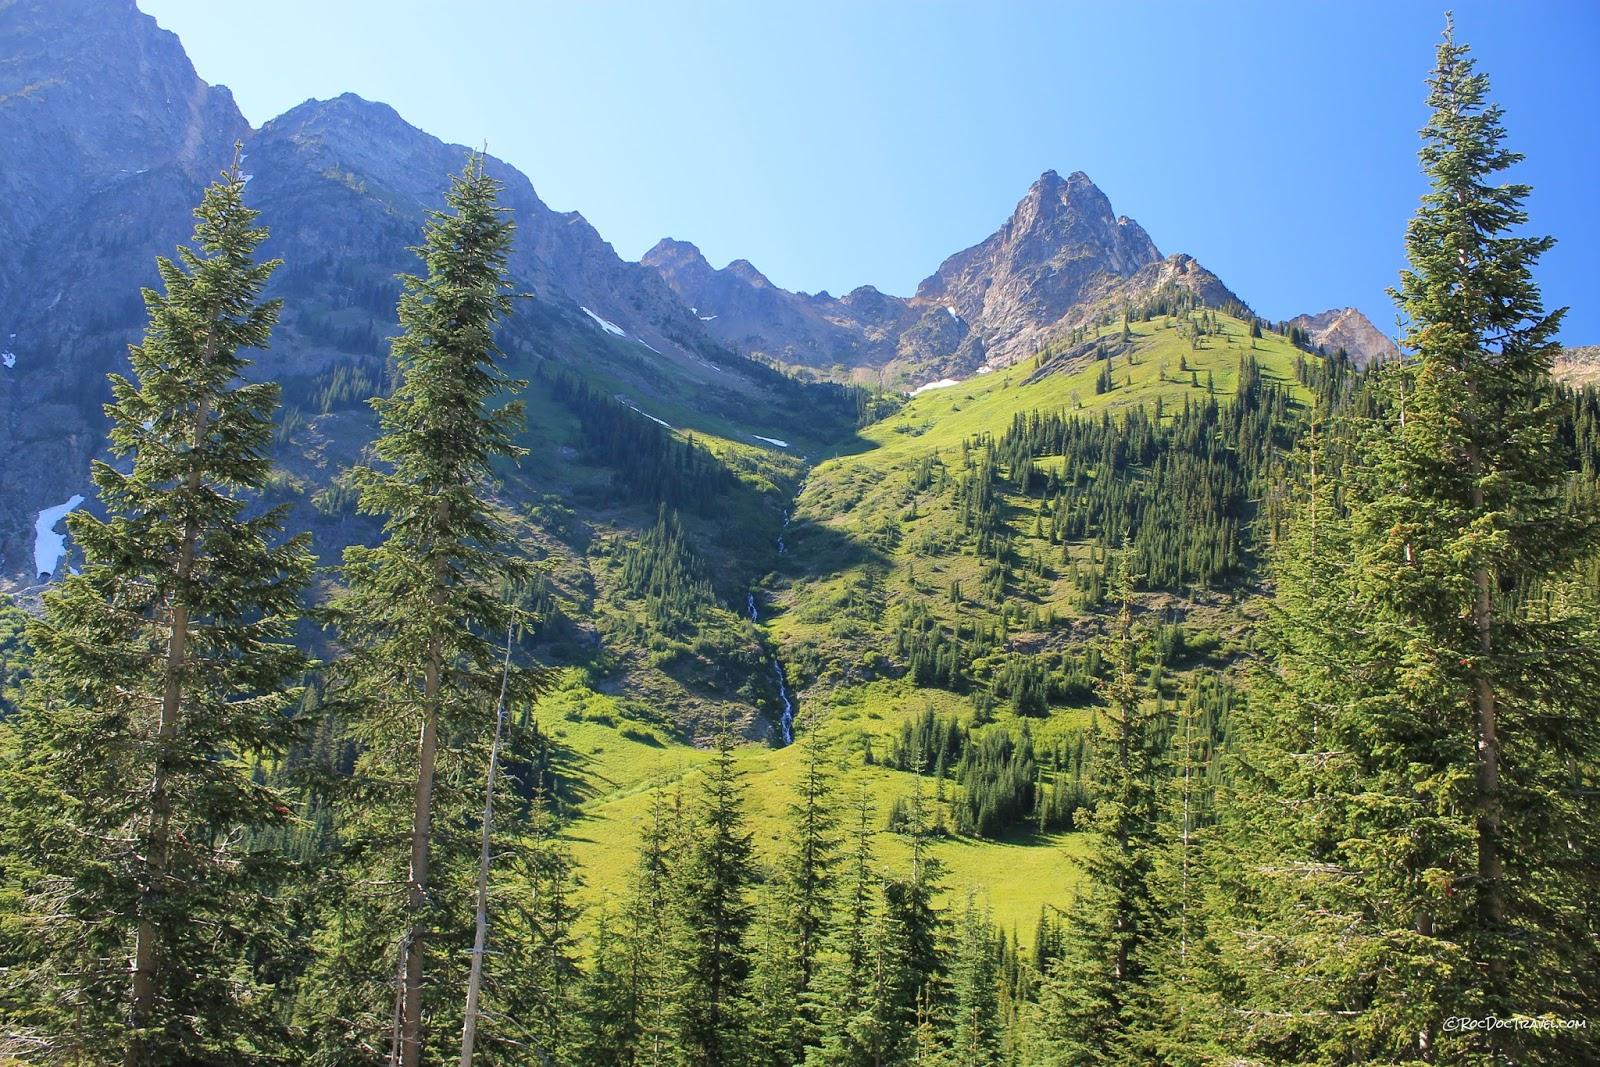 north Cascades National Park Oso landslide Mount Baker volcano glacier Washington copyright rocdoctravel.com